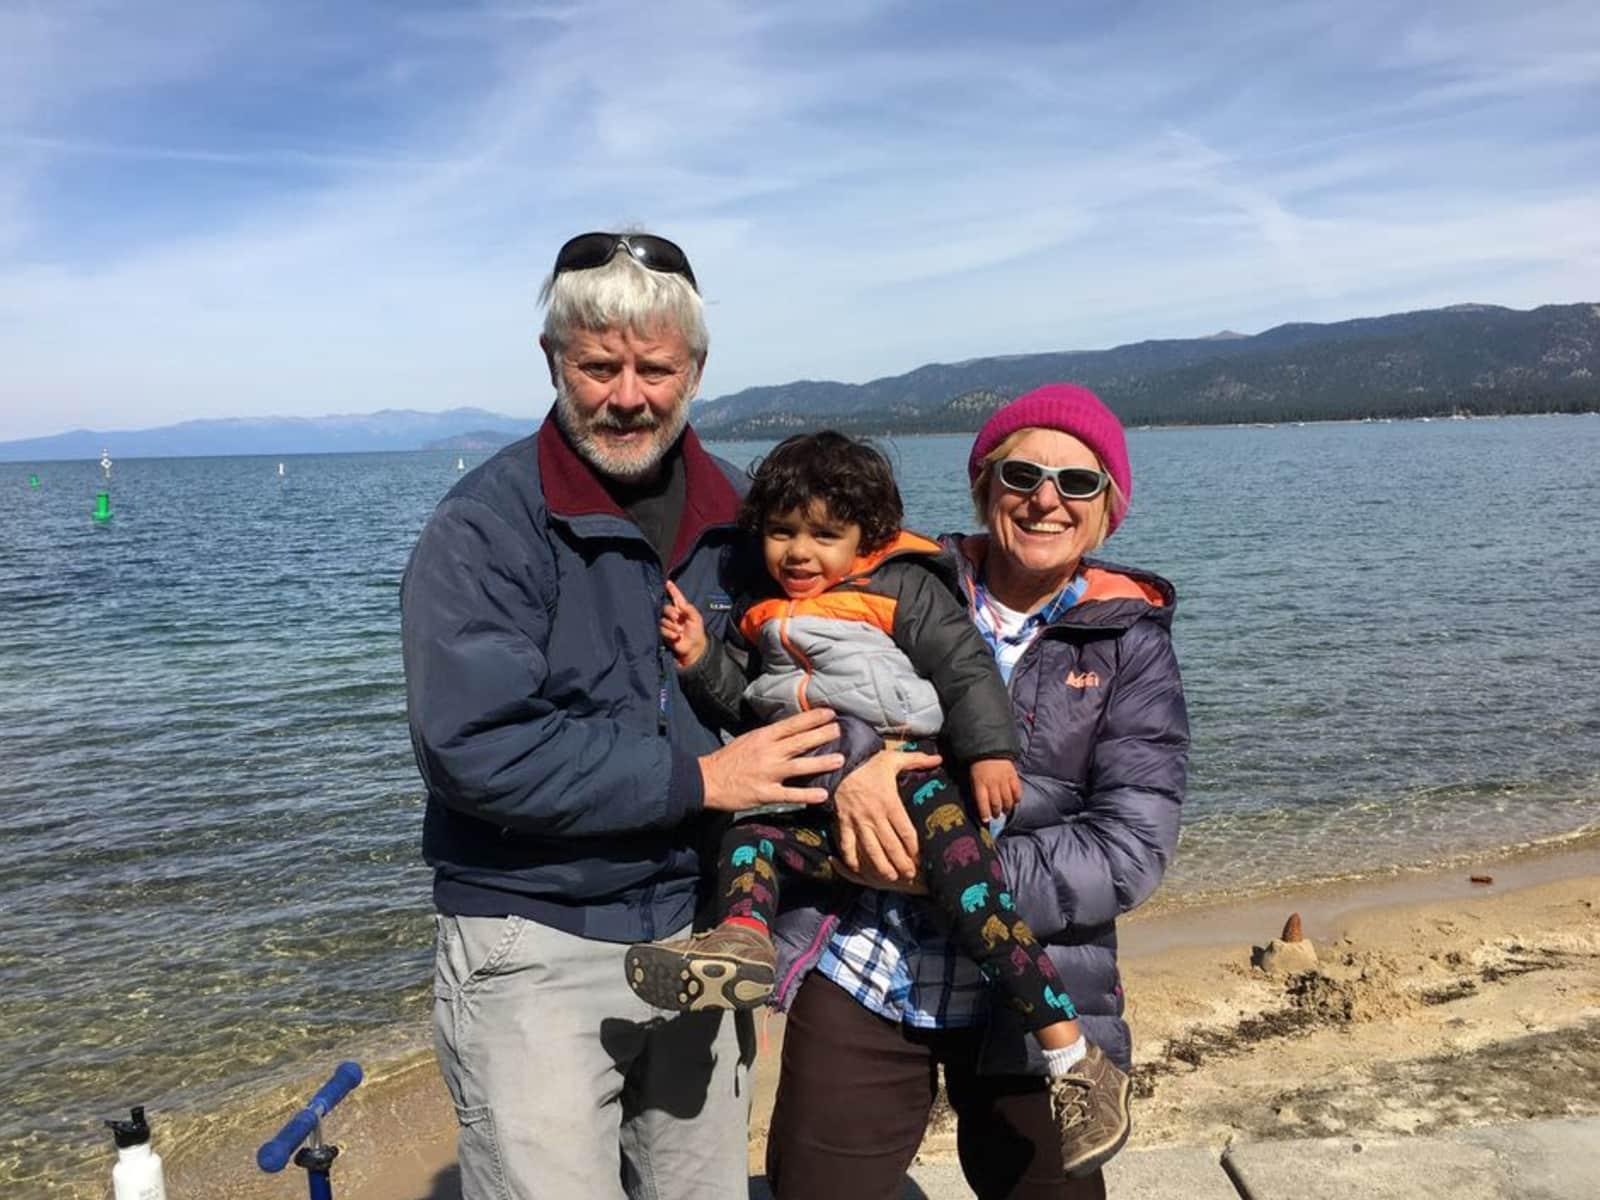 Tom & Cynthia from Berkeley, California, United States